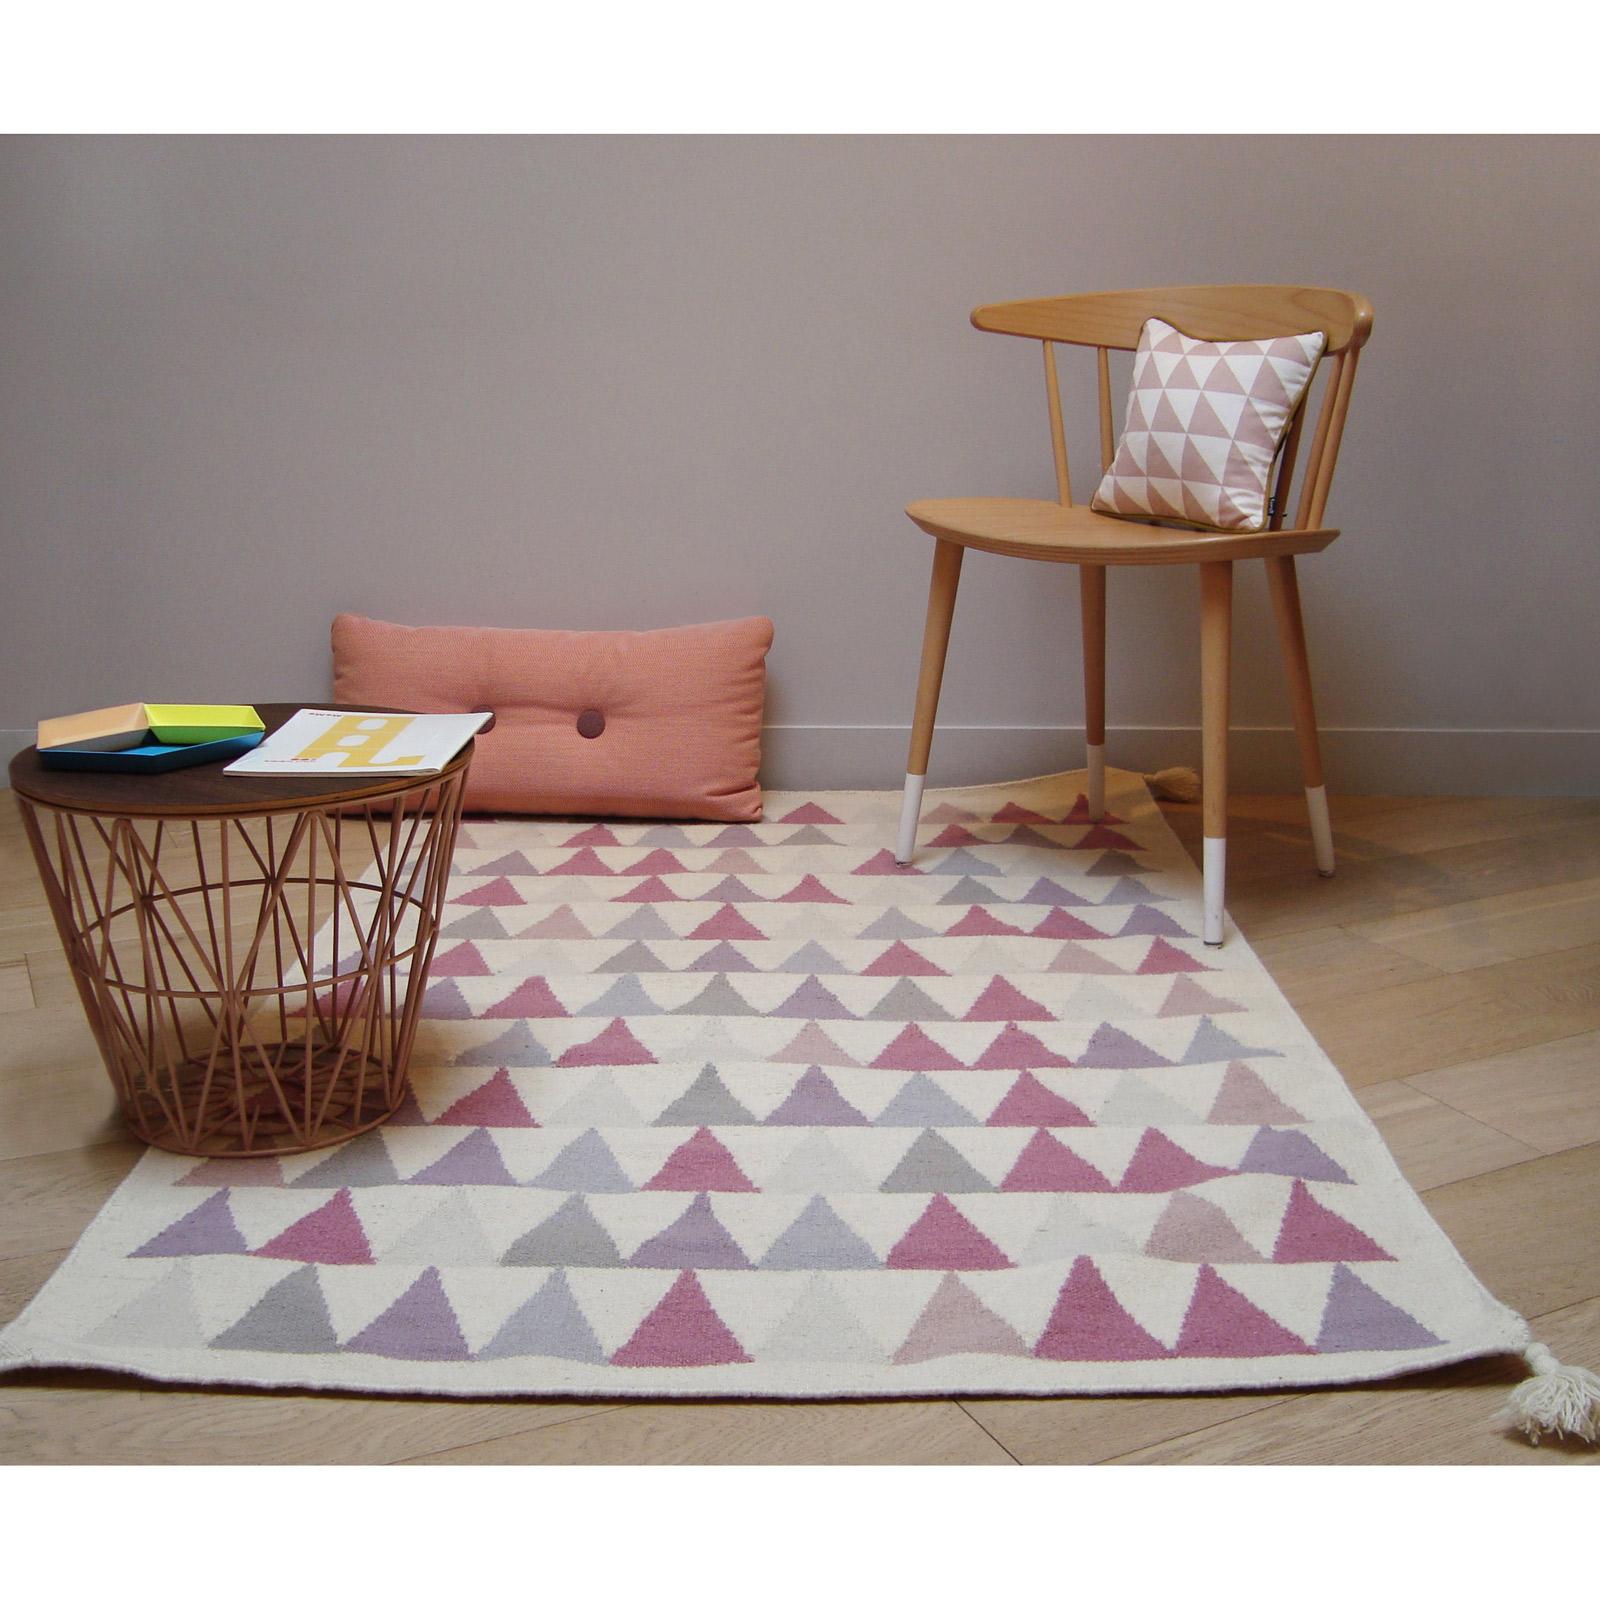 Tapis fille Kilim rose triangles (110 x 160 cm)